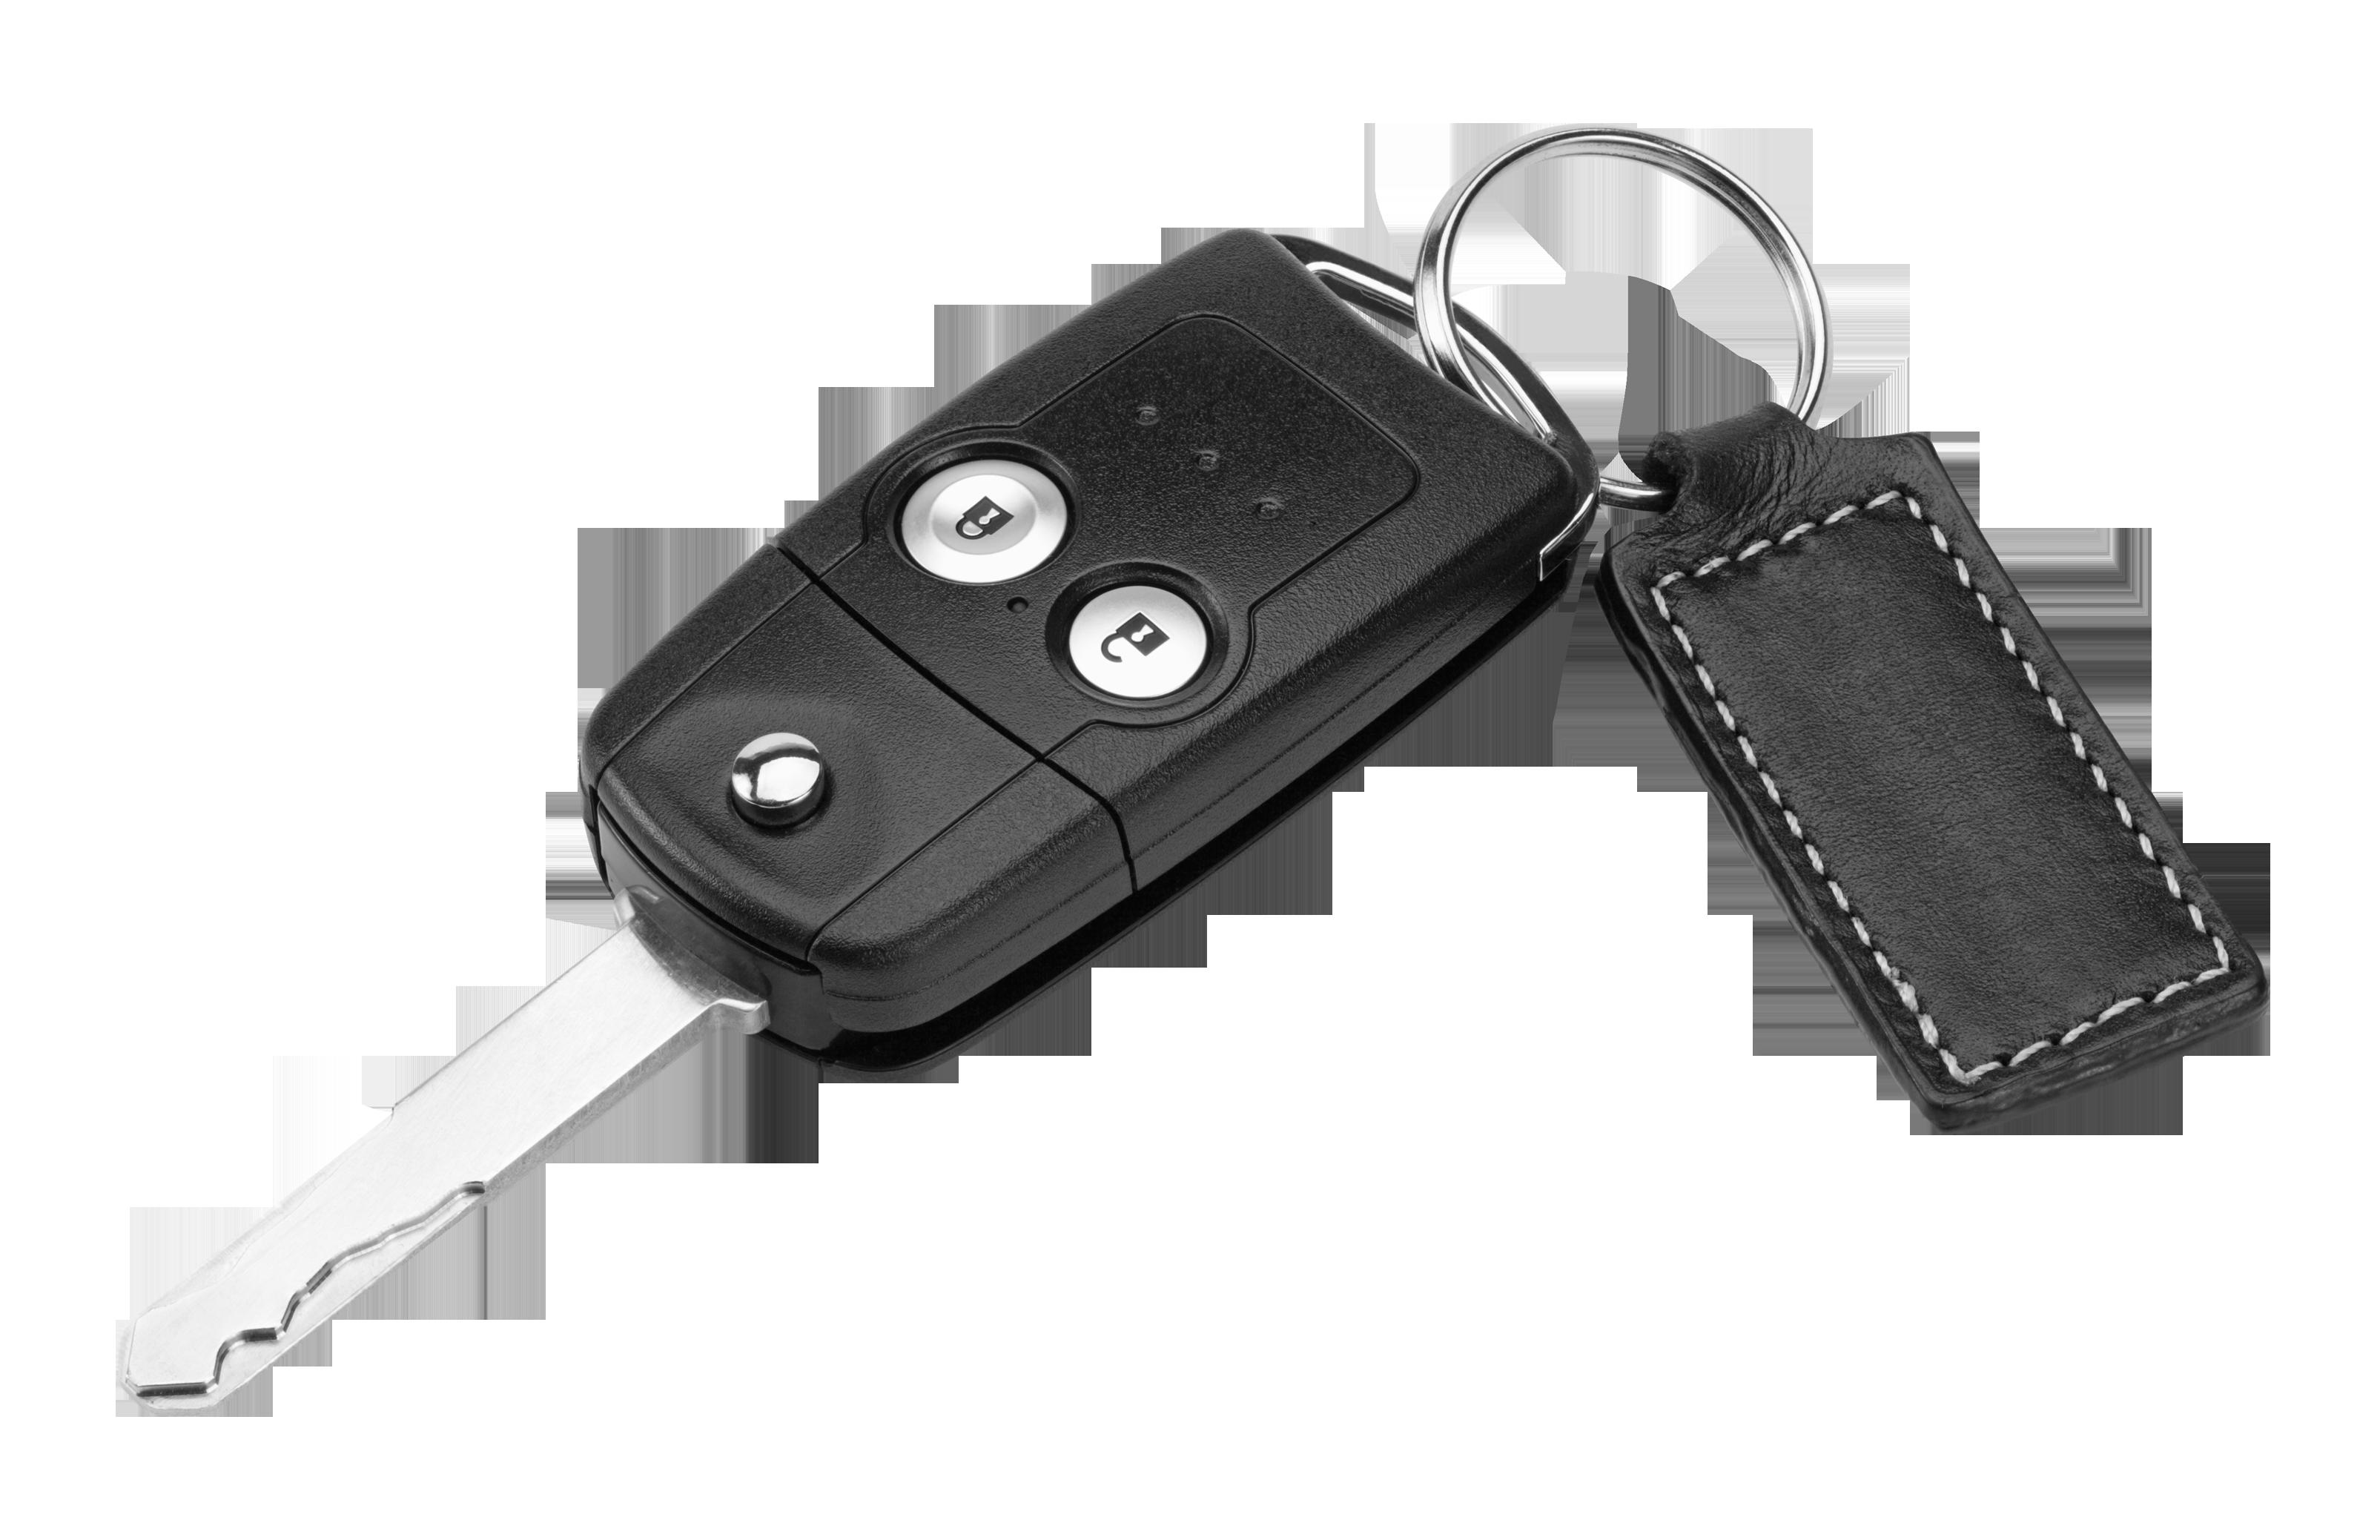 Car key png image purepng free transparent cc0 png for Key motors used cars